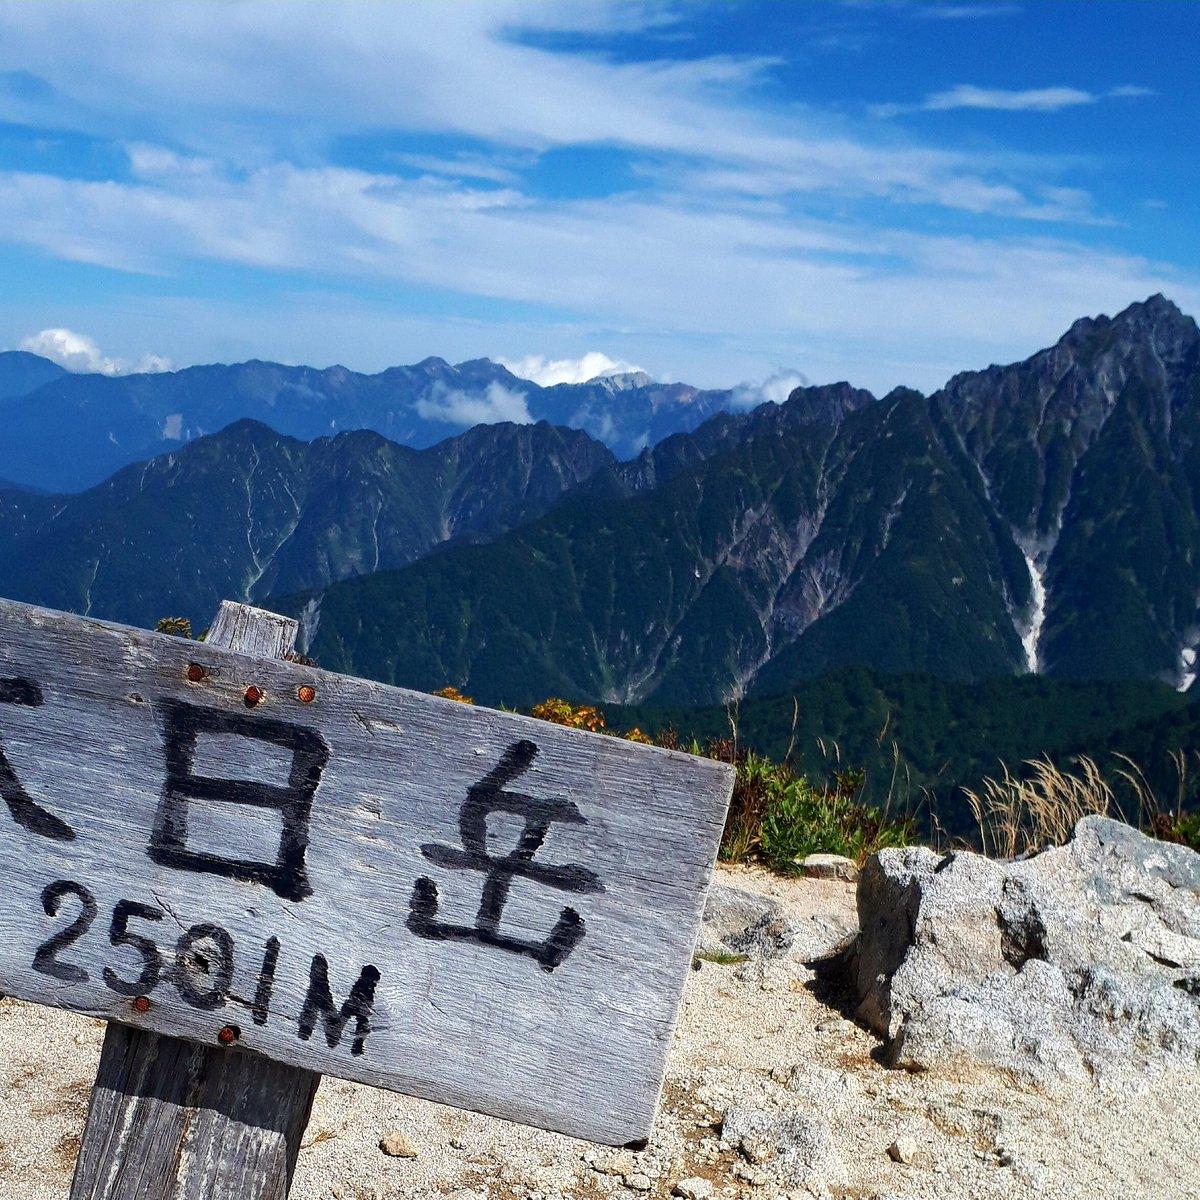 tdg_trekking photo